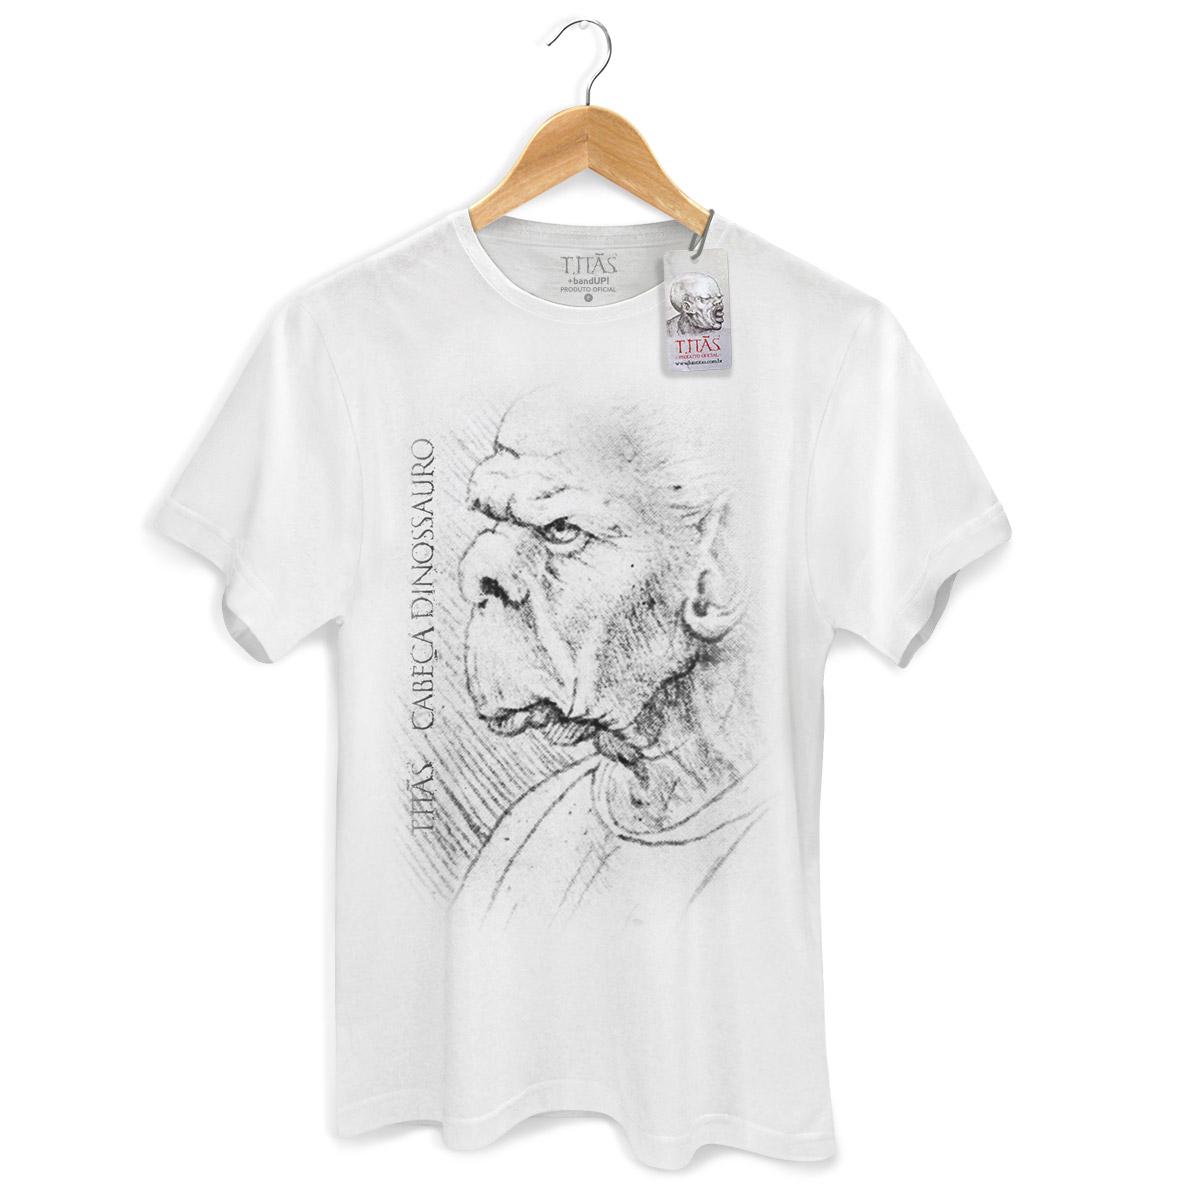 Camiseta Masculina Tit�s Cabe�a Dinossauro 2